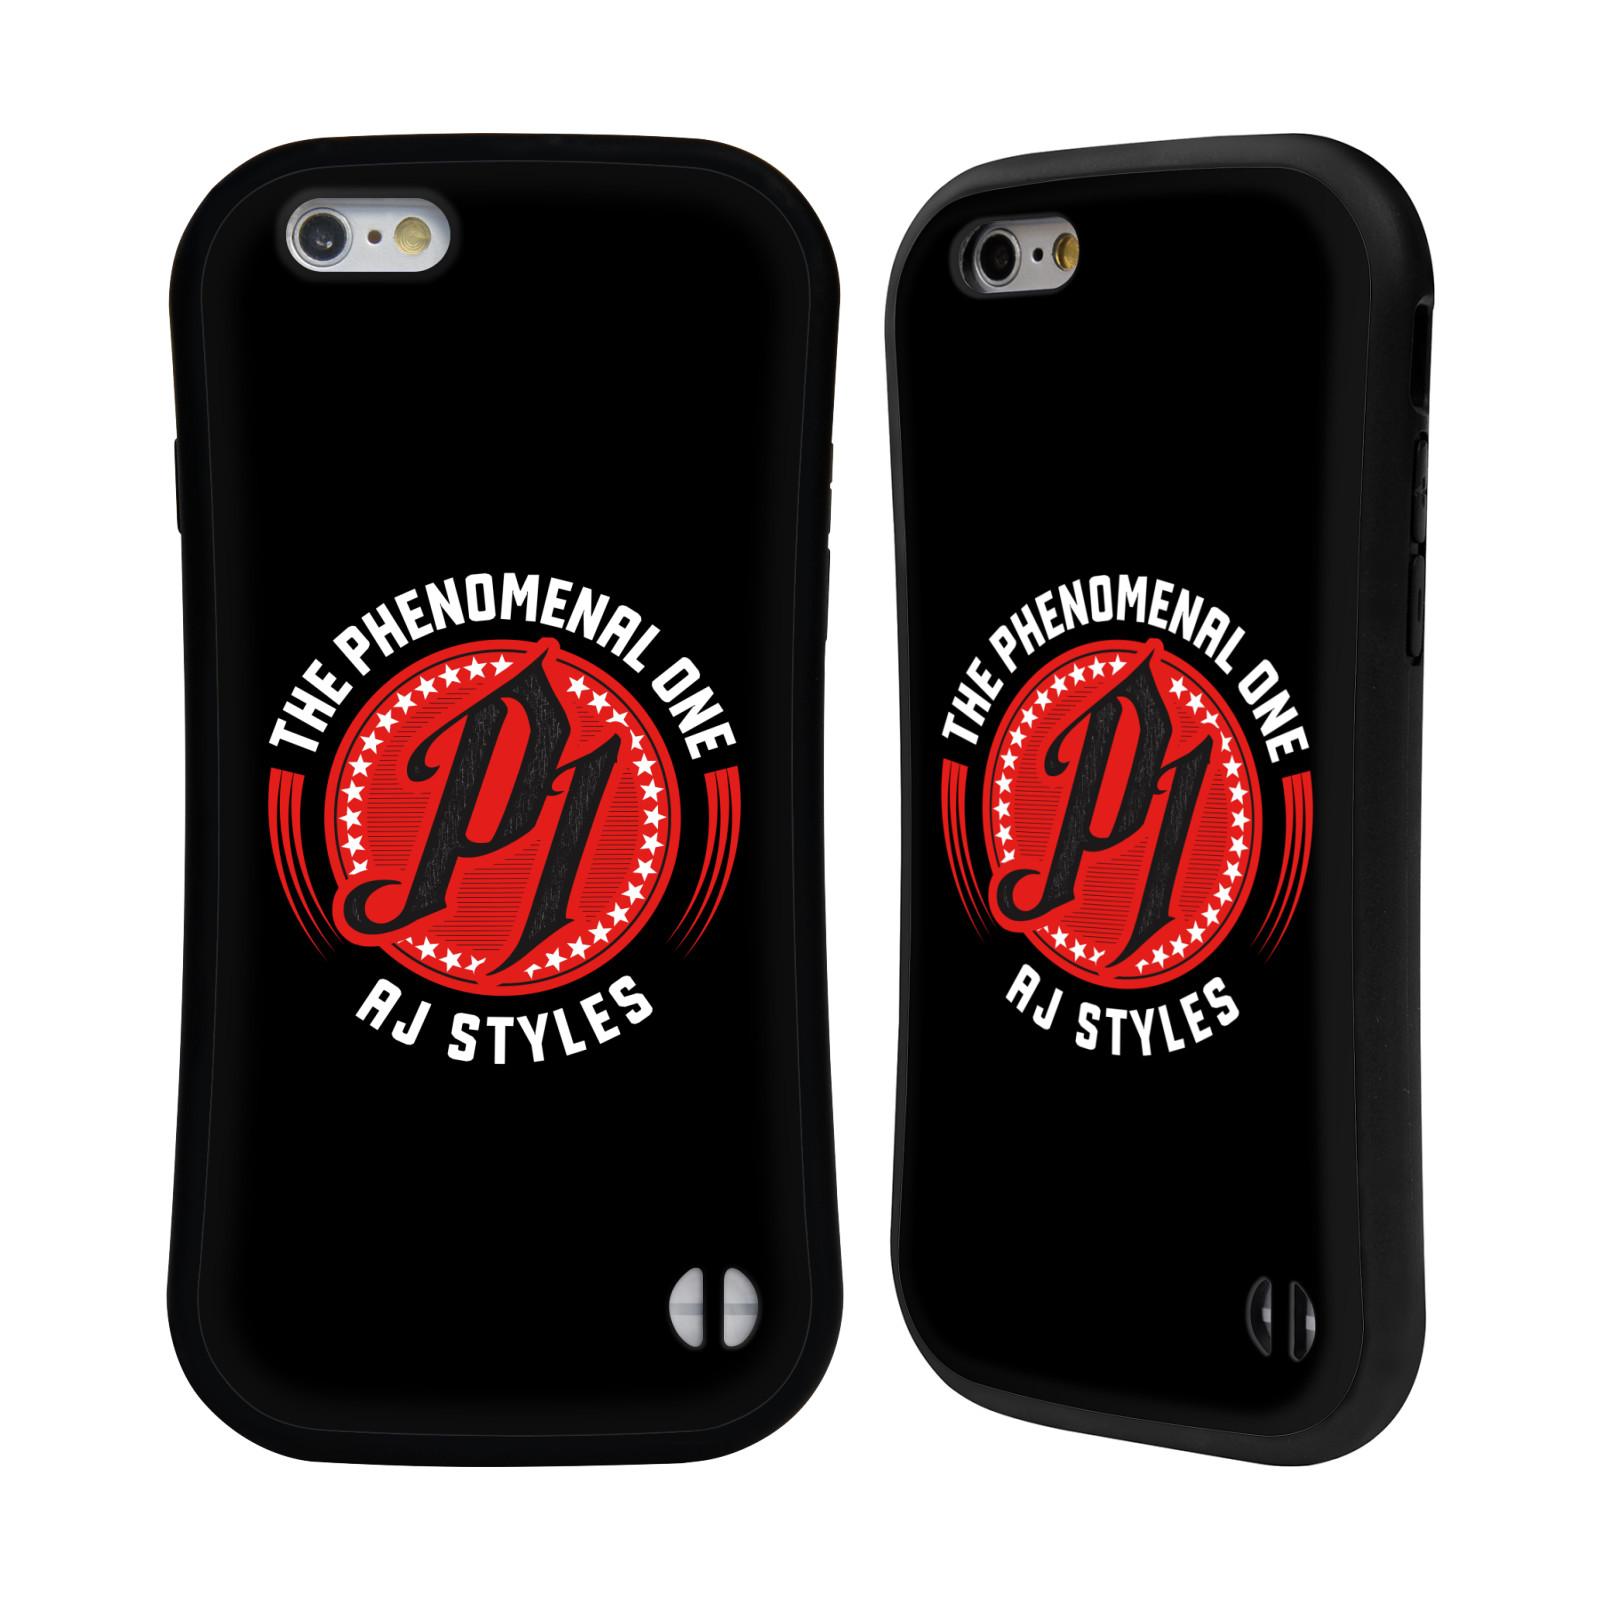 UFFICIALE-WWE-2017-AJ-STYLES-CASE-IBRIDA-PER-APPLE-iPHONES-TELEFONI